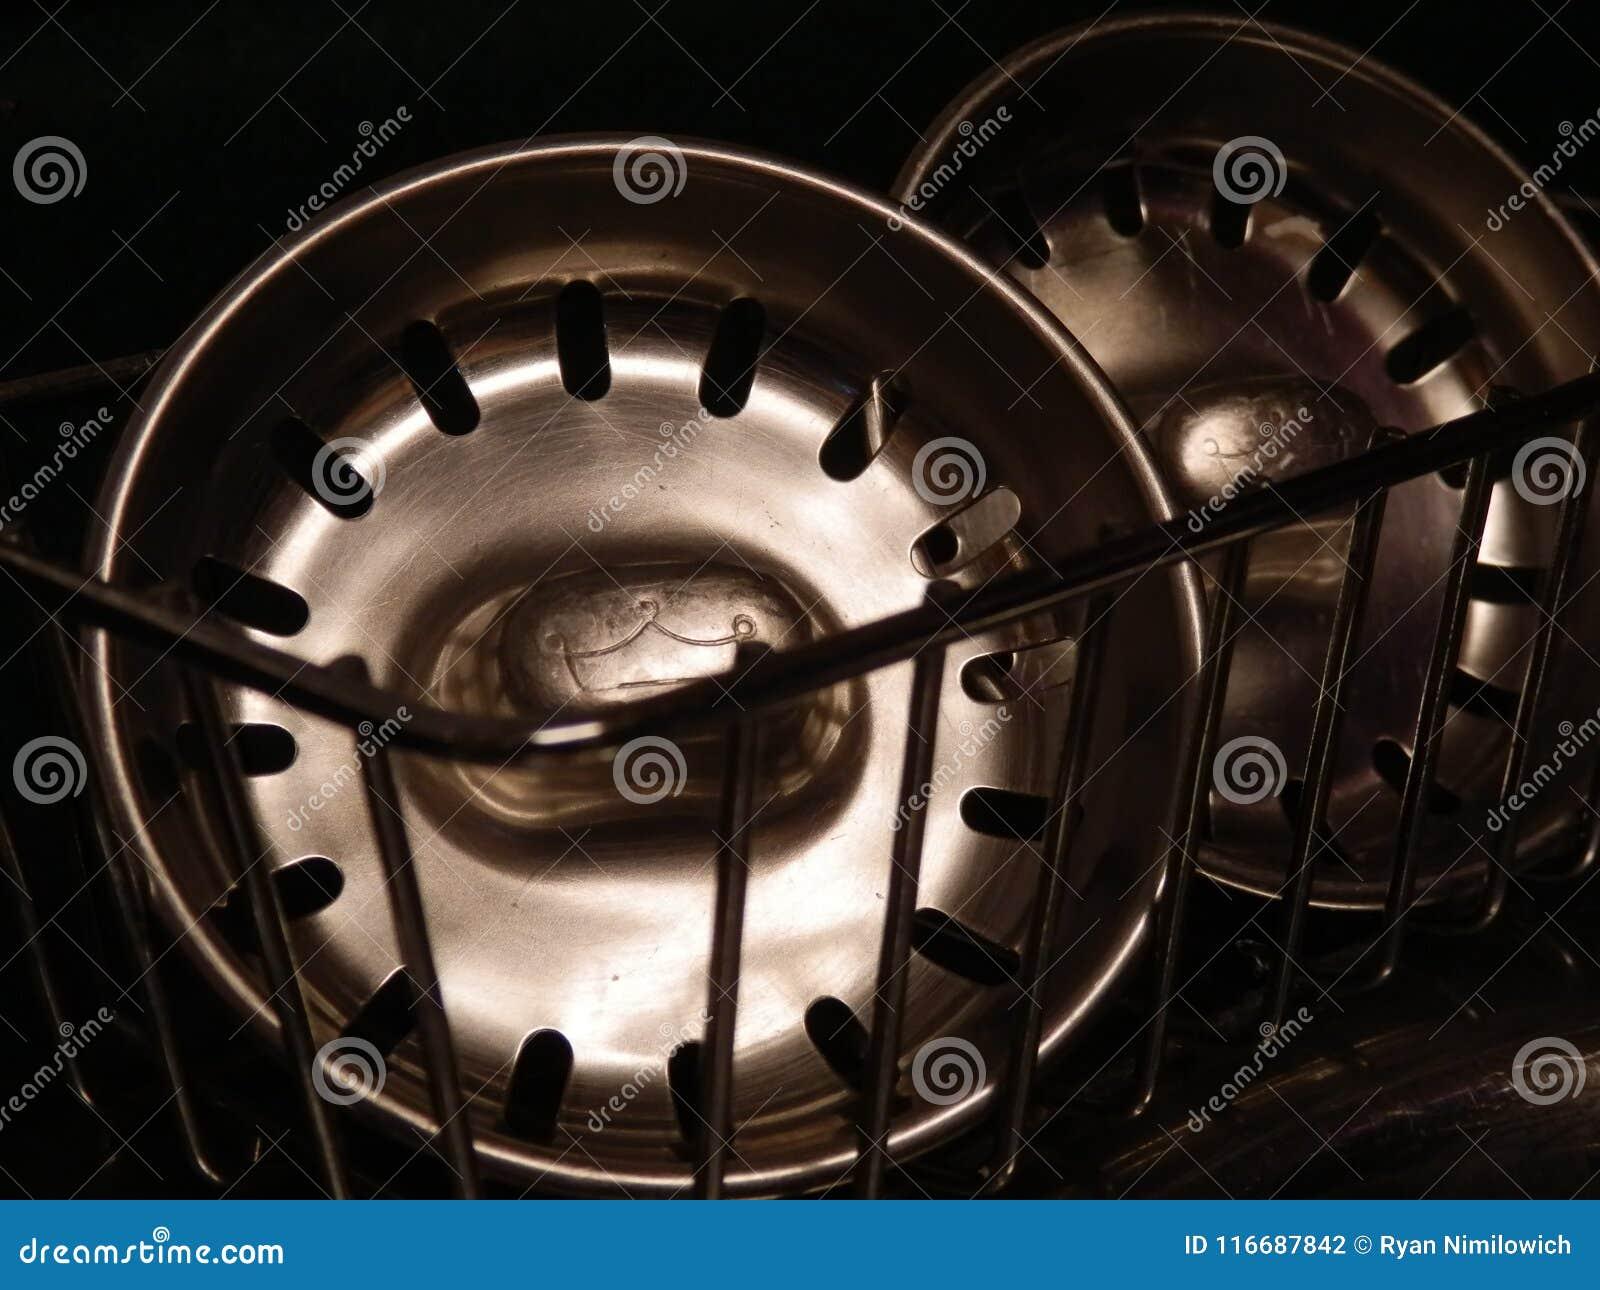 Kitchen Sink Plug stock photo. Image of pair, shiny - 116687842